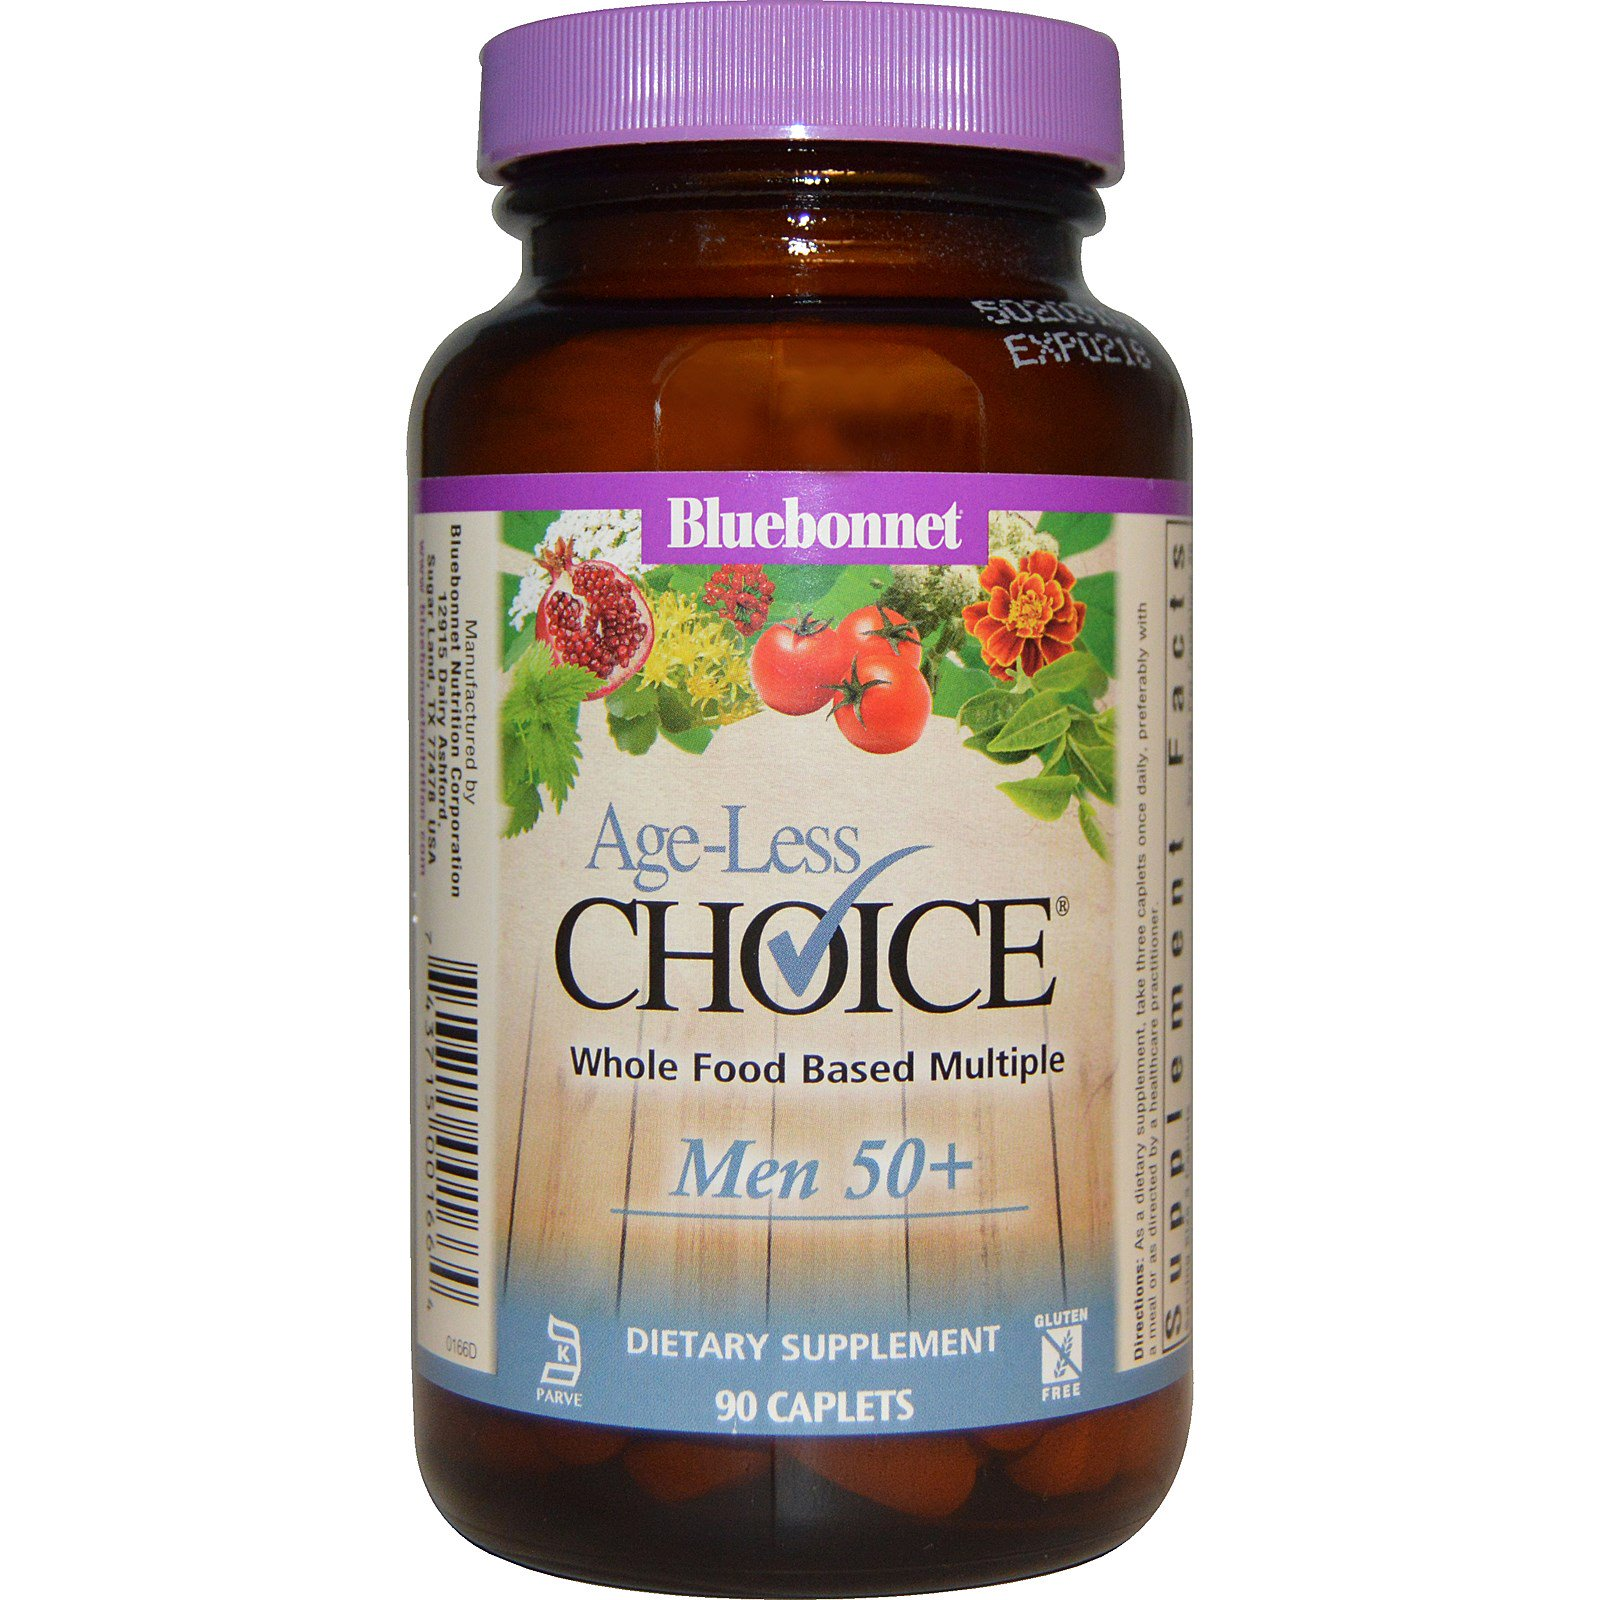 Bluebonnet Nutrition, Age-Less Choice, Whole Food Based Multiple, Men 50+, 90 Caplets (Discontinued Item)